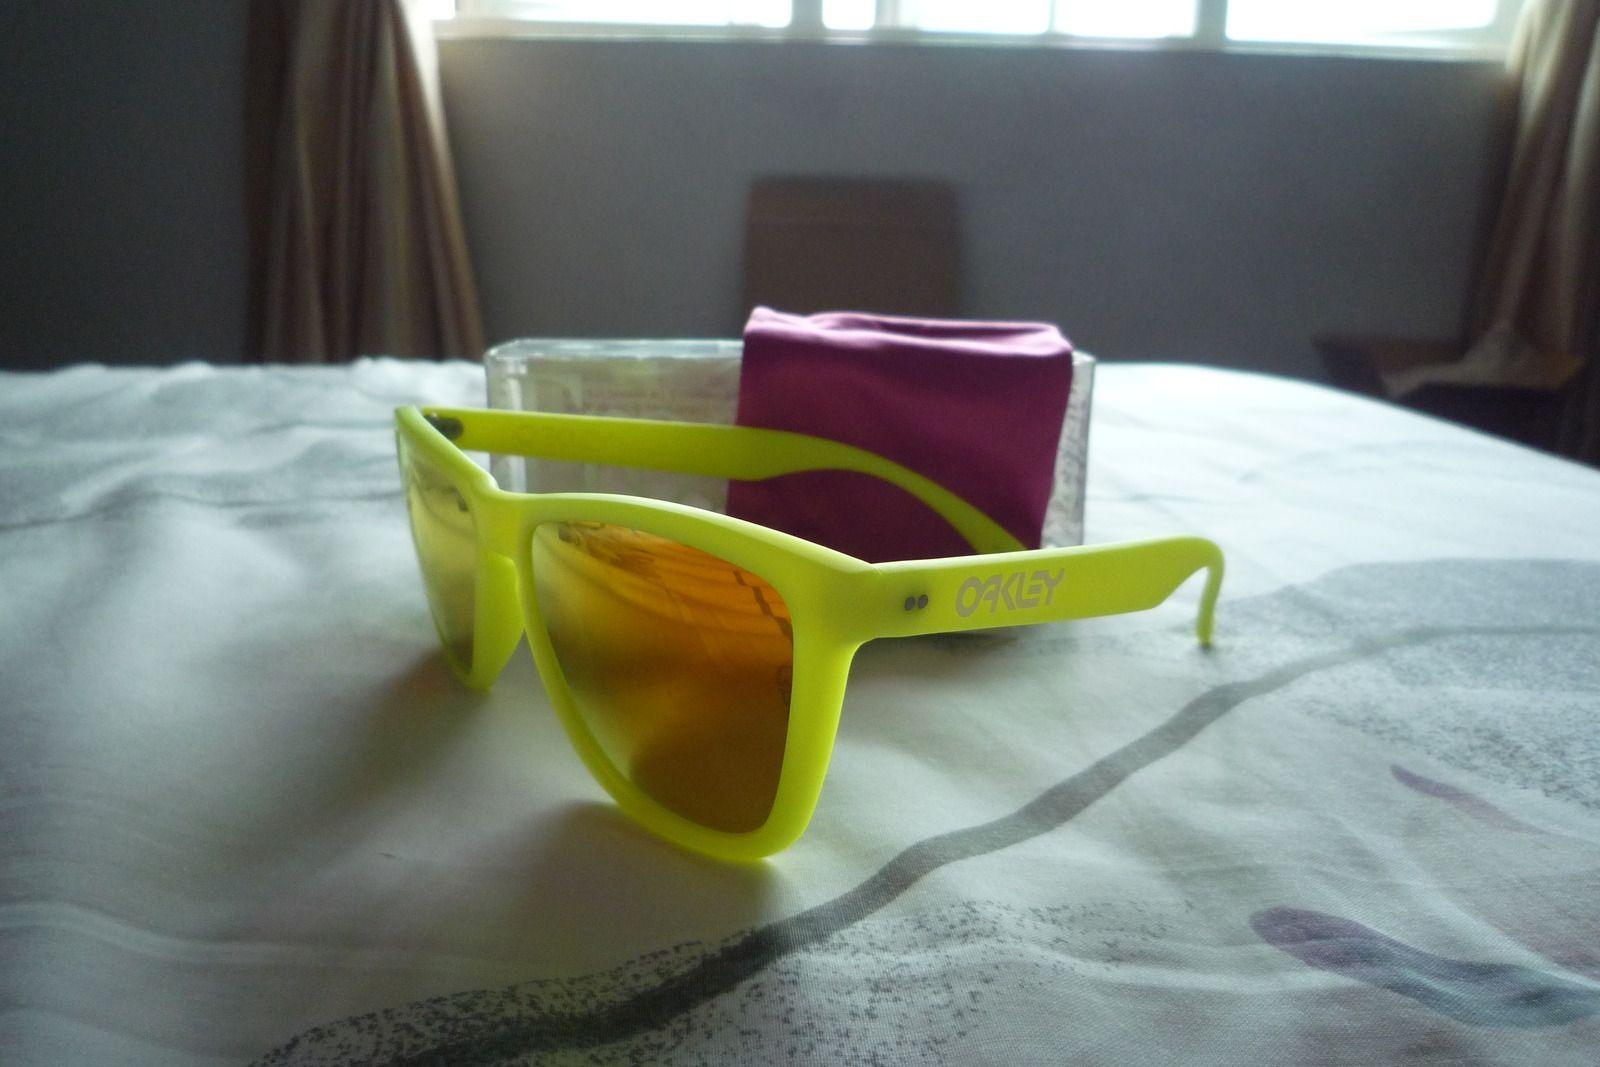 Gen 1 Japan Frogskins Neon Yellow/Orange Iridium BNIB/MINT - p1020334p.jpg